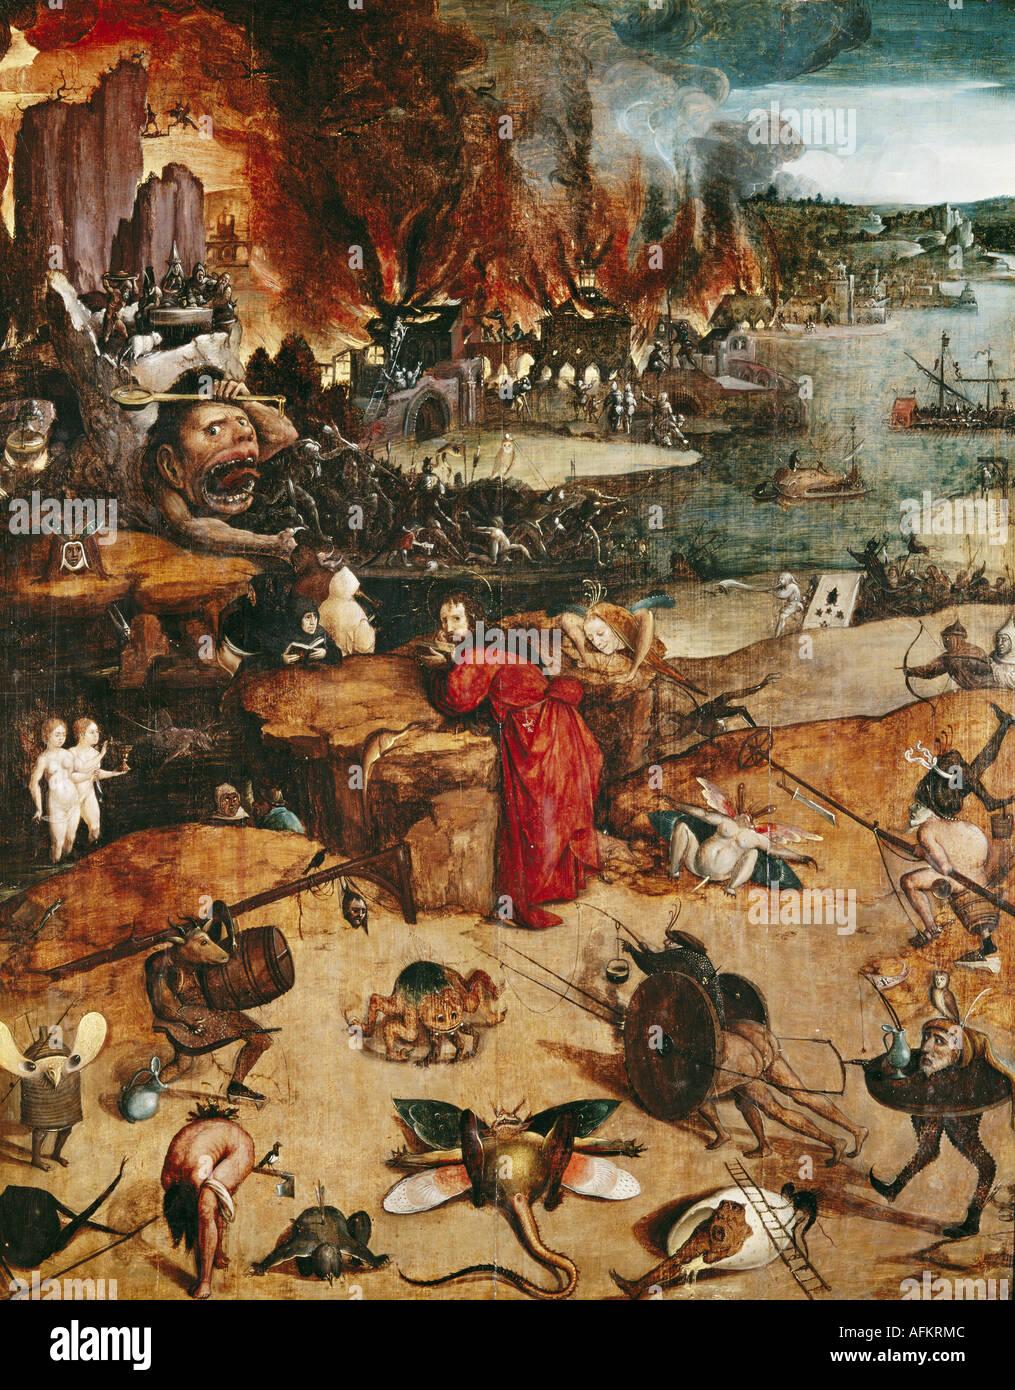 """fine arts, Bosch, Hieronymus (circa 1450 - 1516), painting, ""the temptation of Saint Anthony"", Prado, Madrid, Spain, Stock Photo"